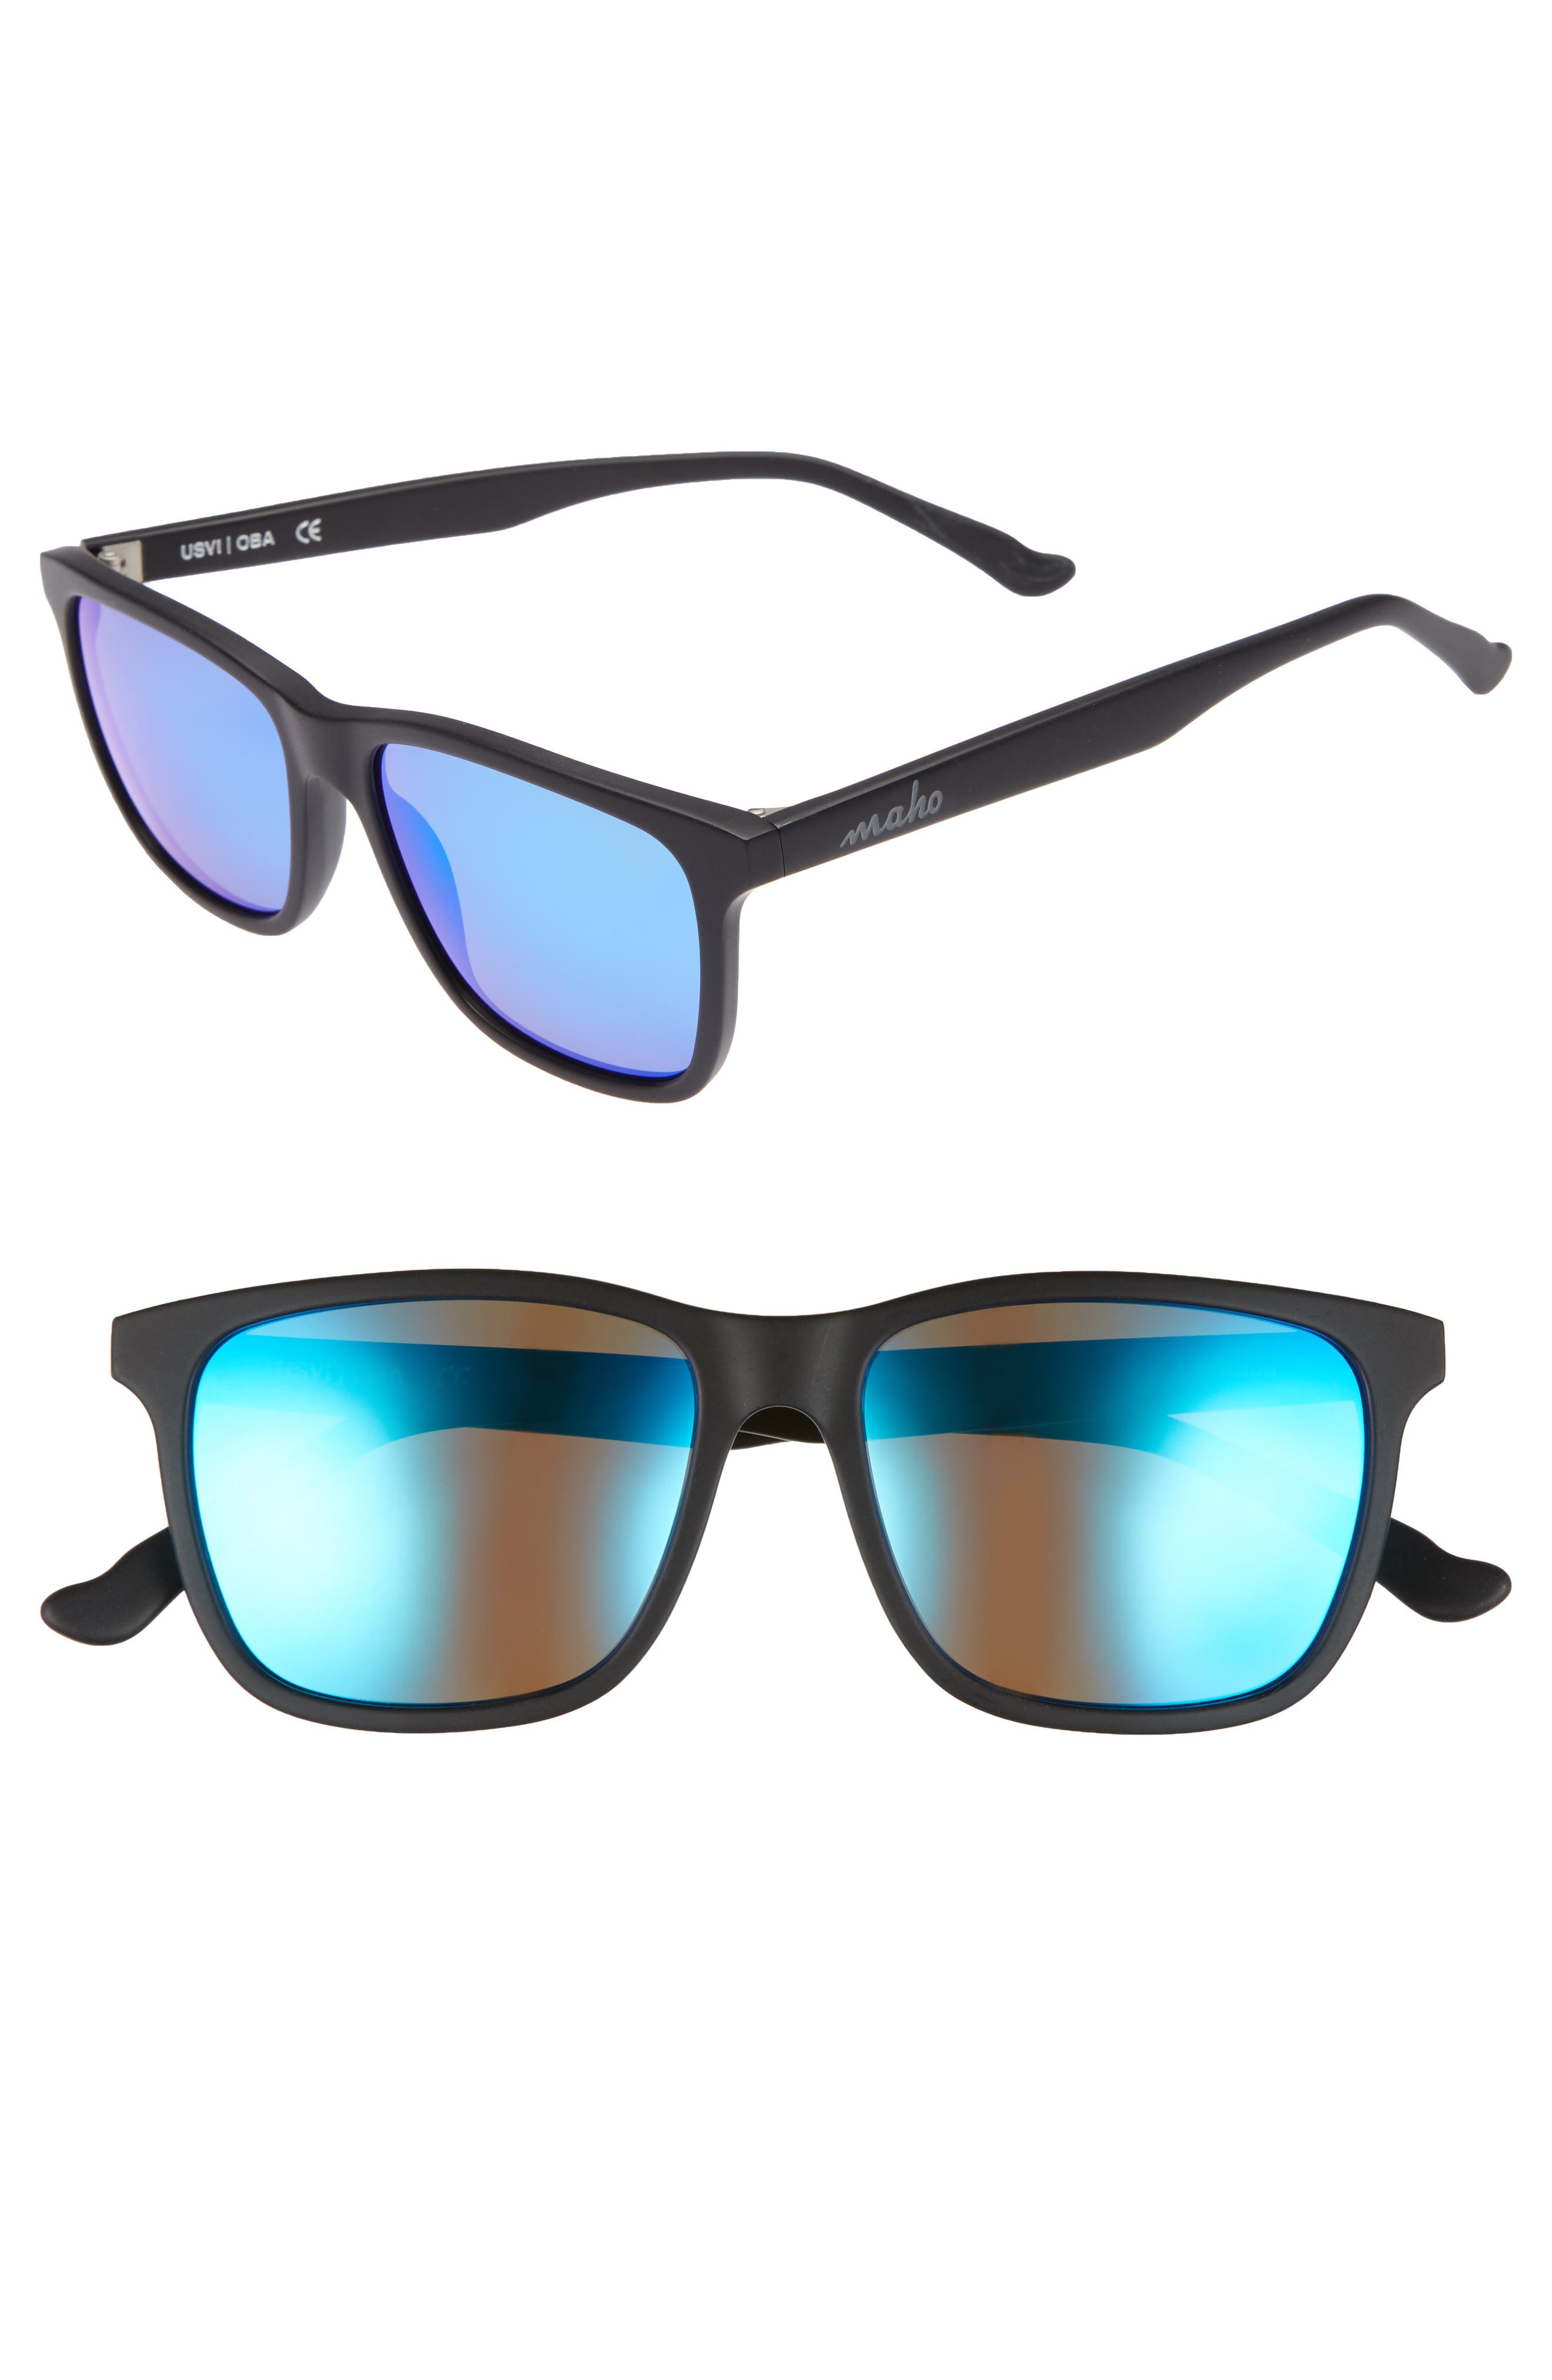 Uluwatu 52mm Polarized Sunglasses,                         Main,                         color, Charcoal